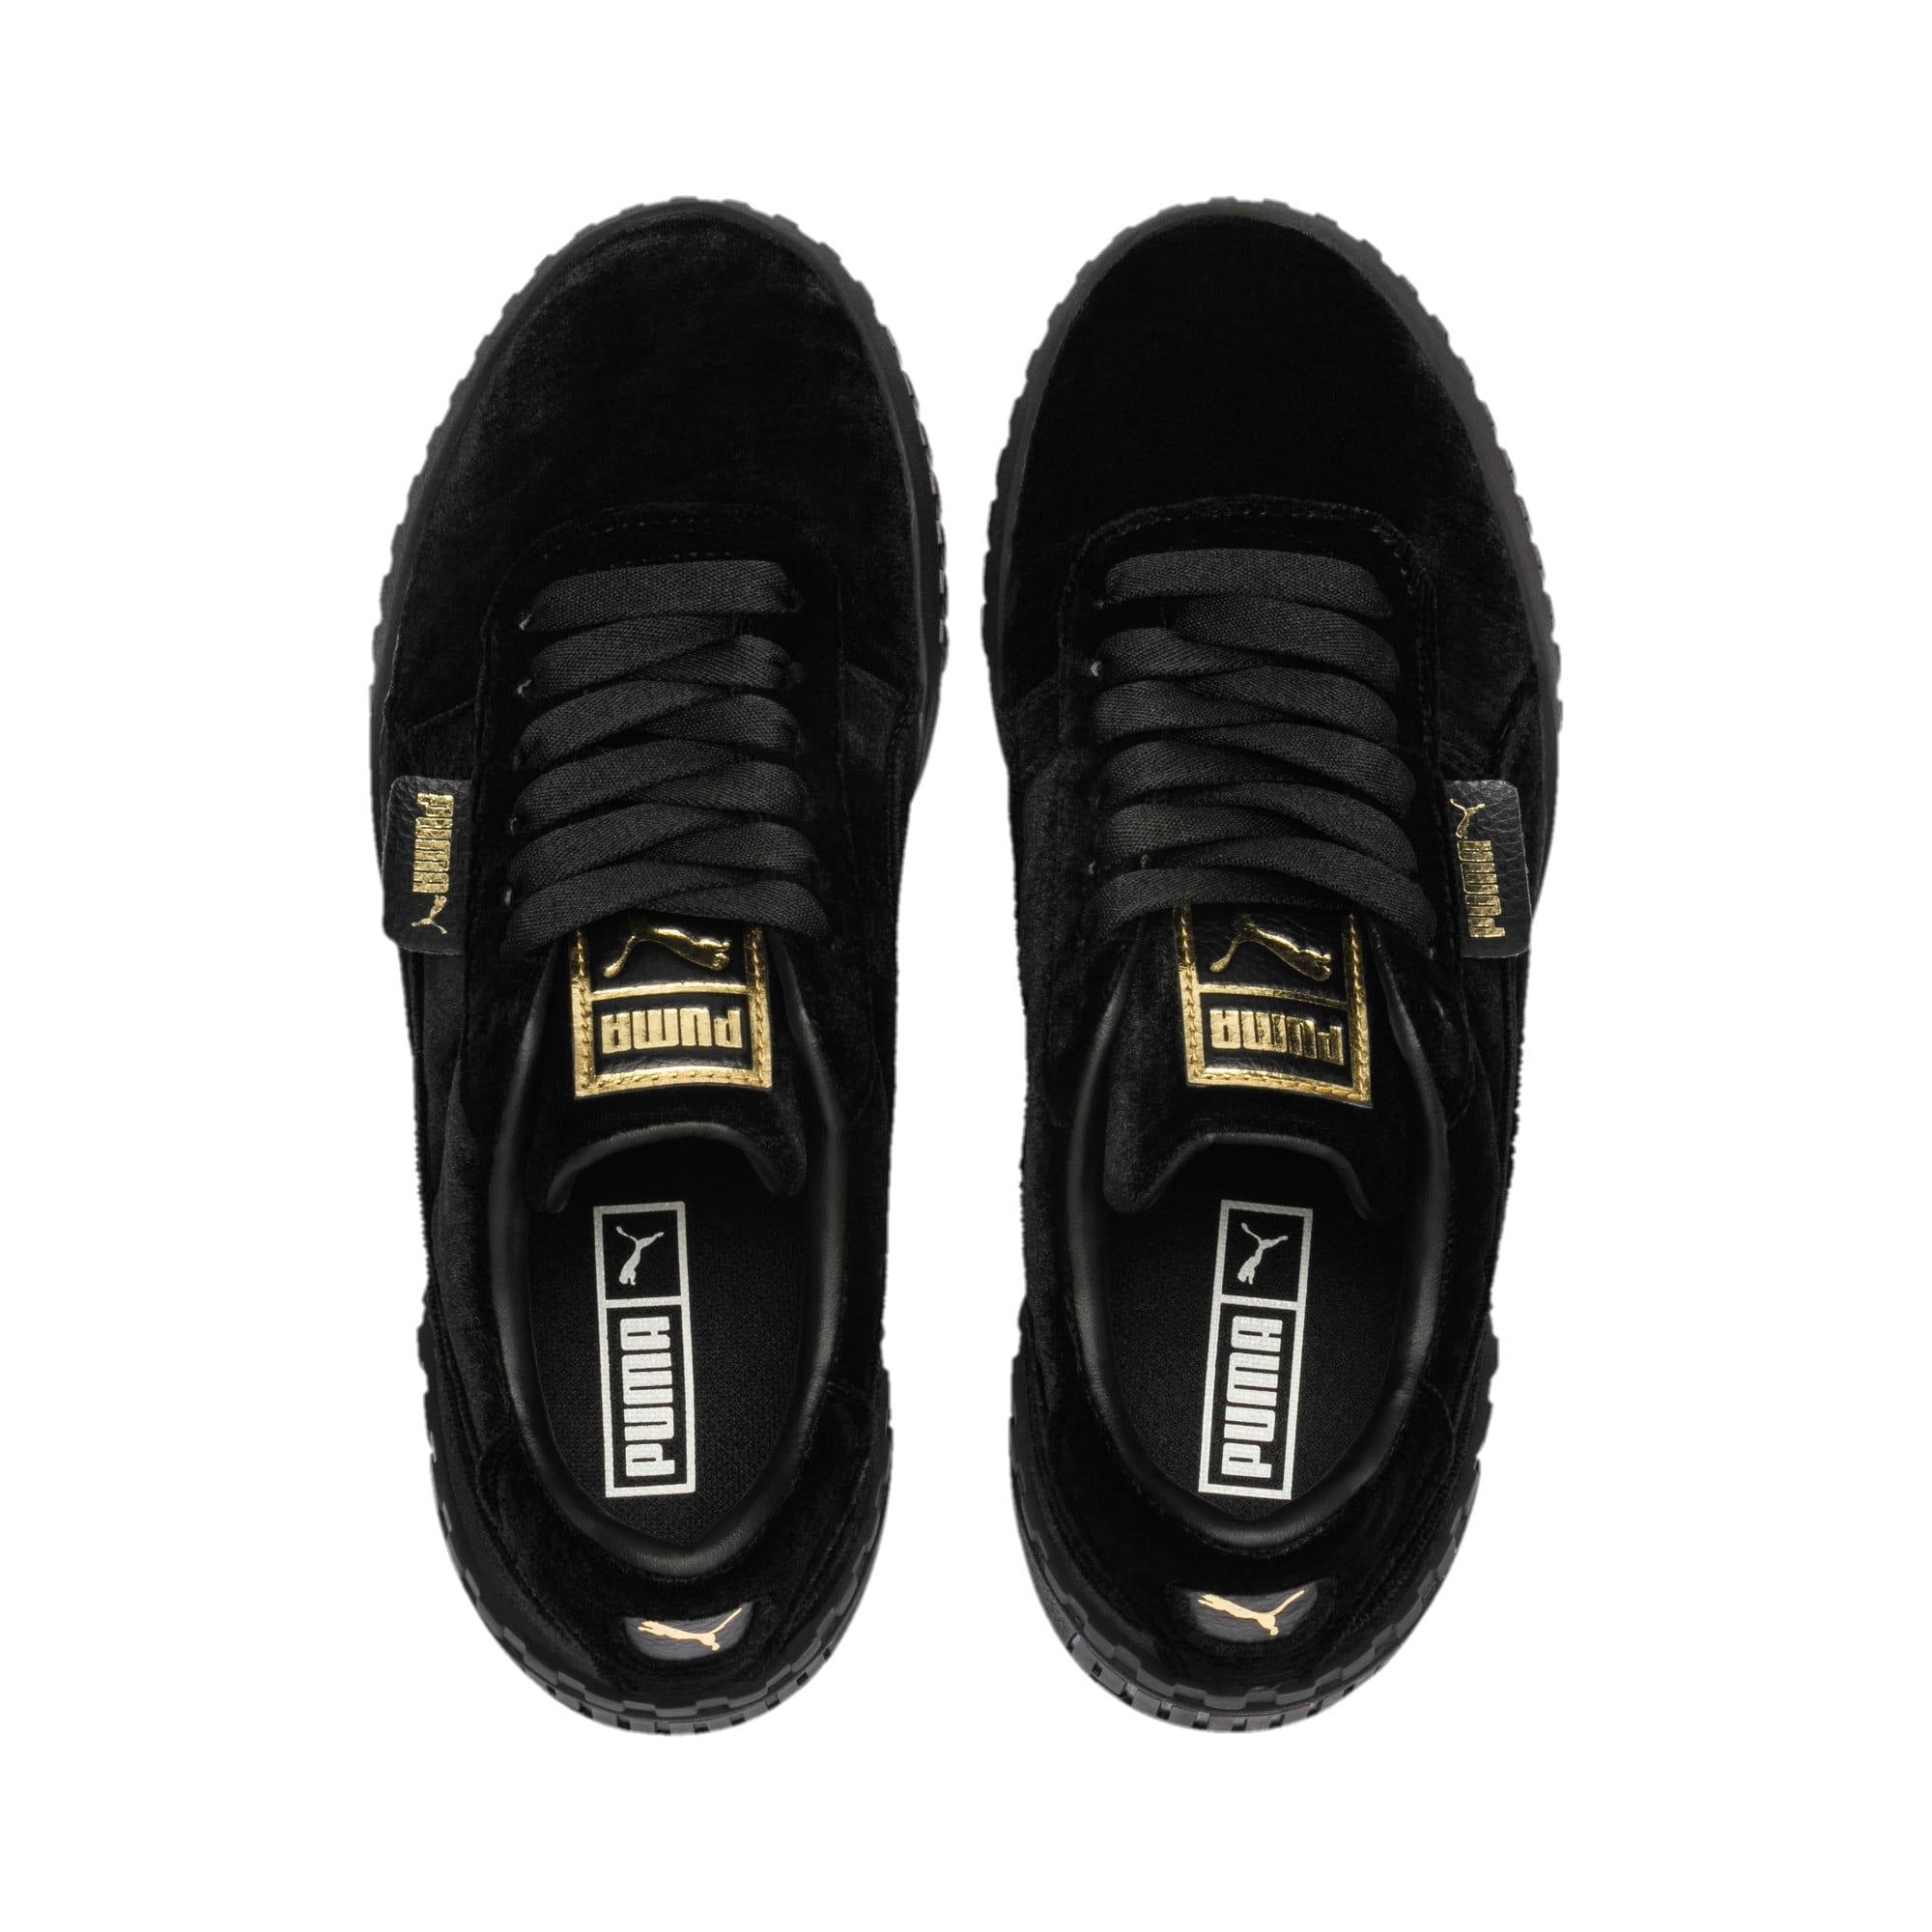 Thumbnail 6 of Cali Velvet Women's Sneakers, Puma Black-Puma Black, medium